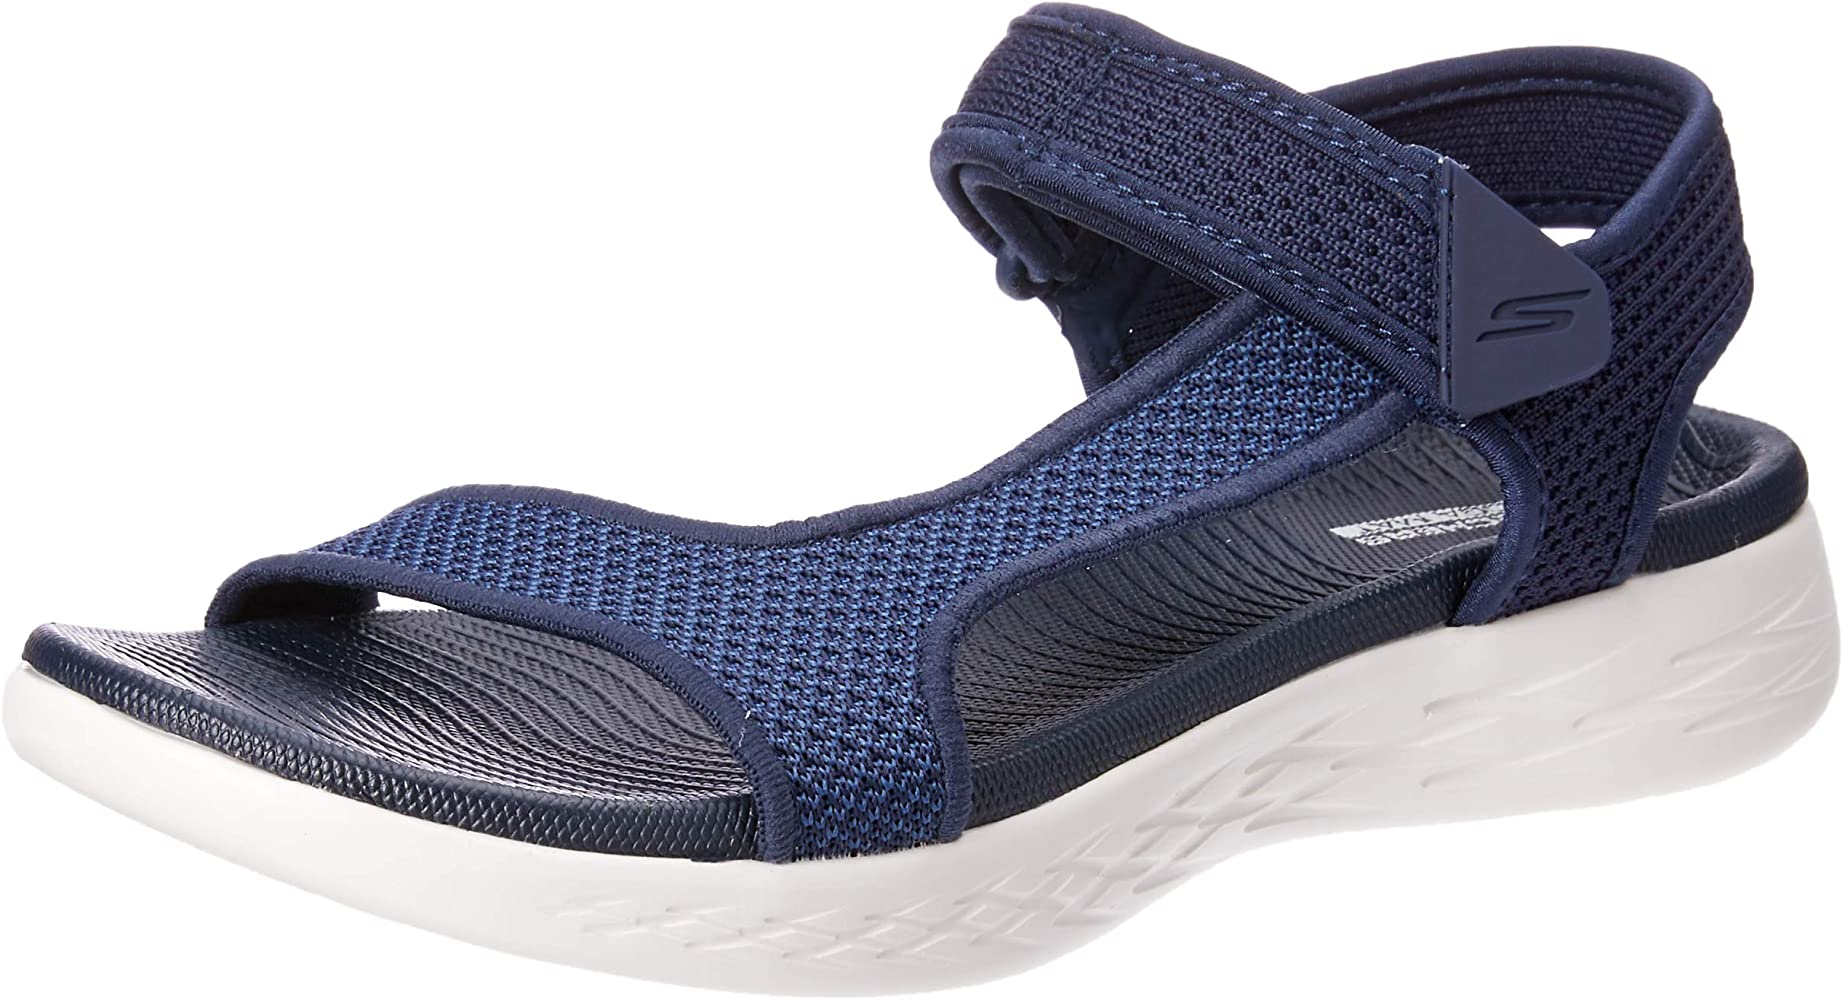 Skechers On The Go 600 Rubix Womens Sandals Navy White 5 Sport Sandals Slides